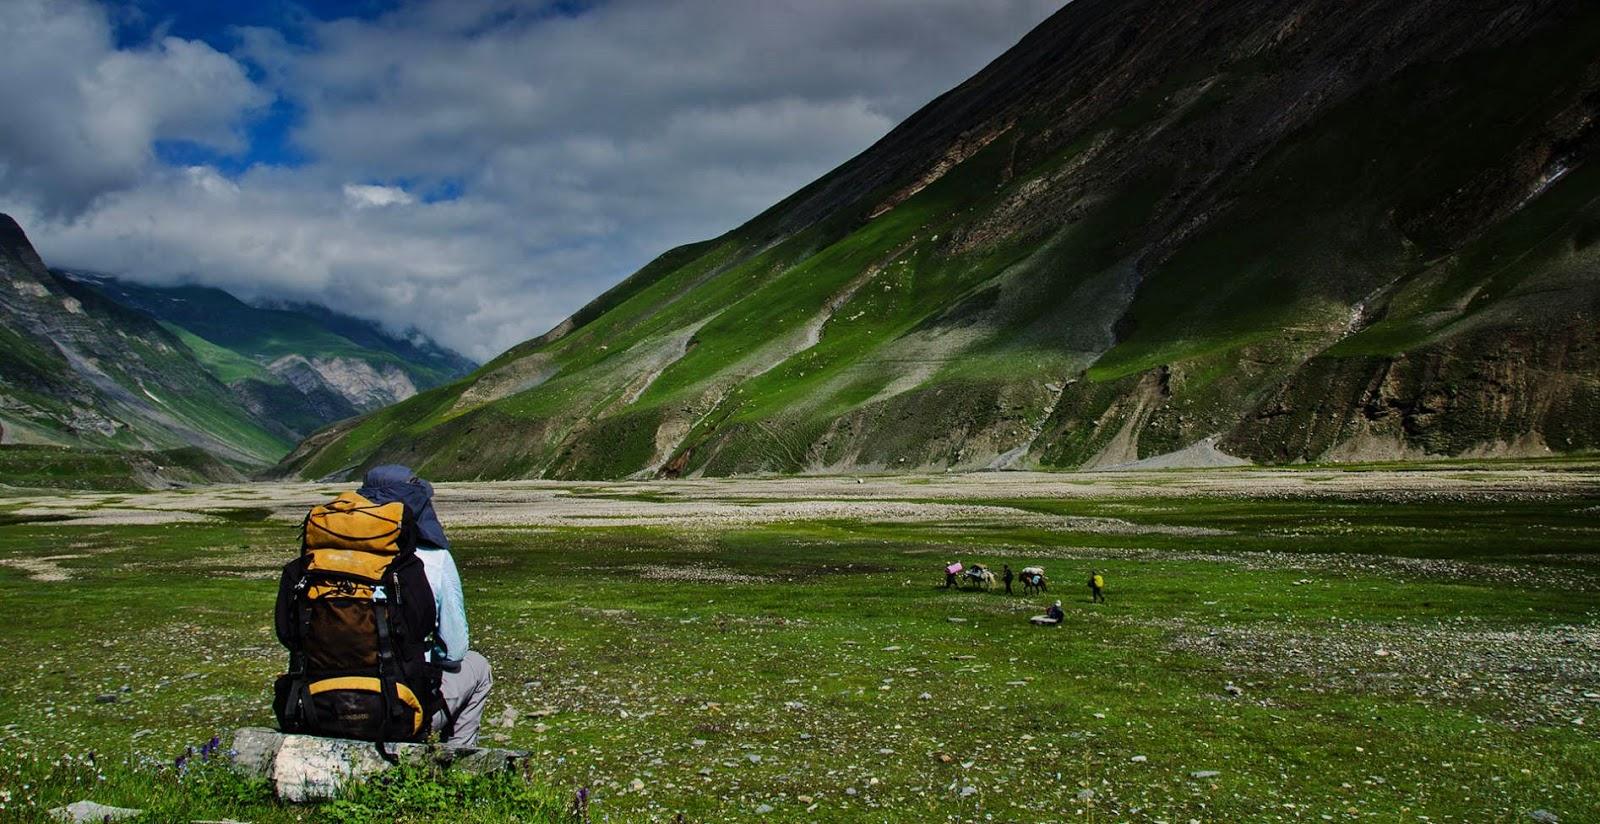 Grasslands between Humpet and Kaintal